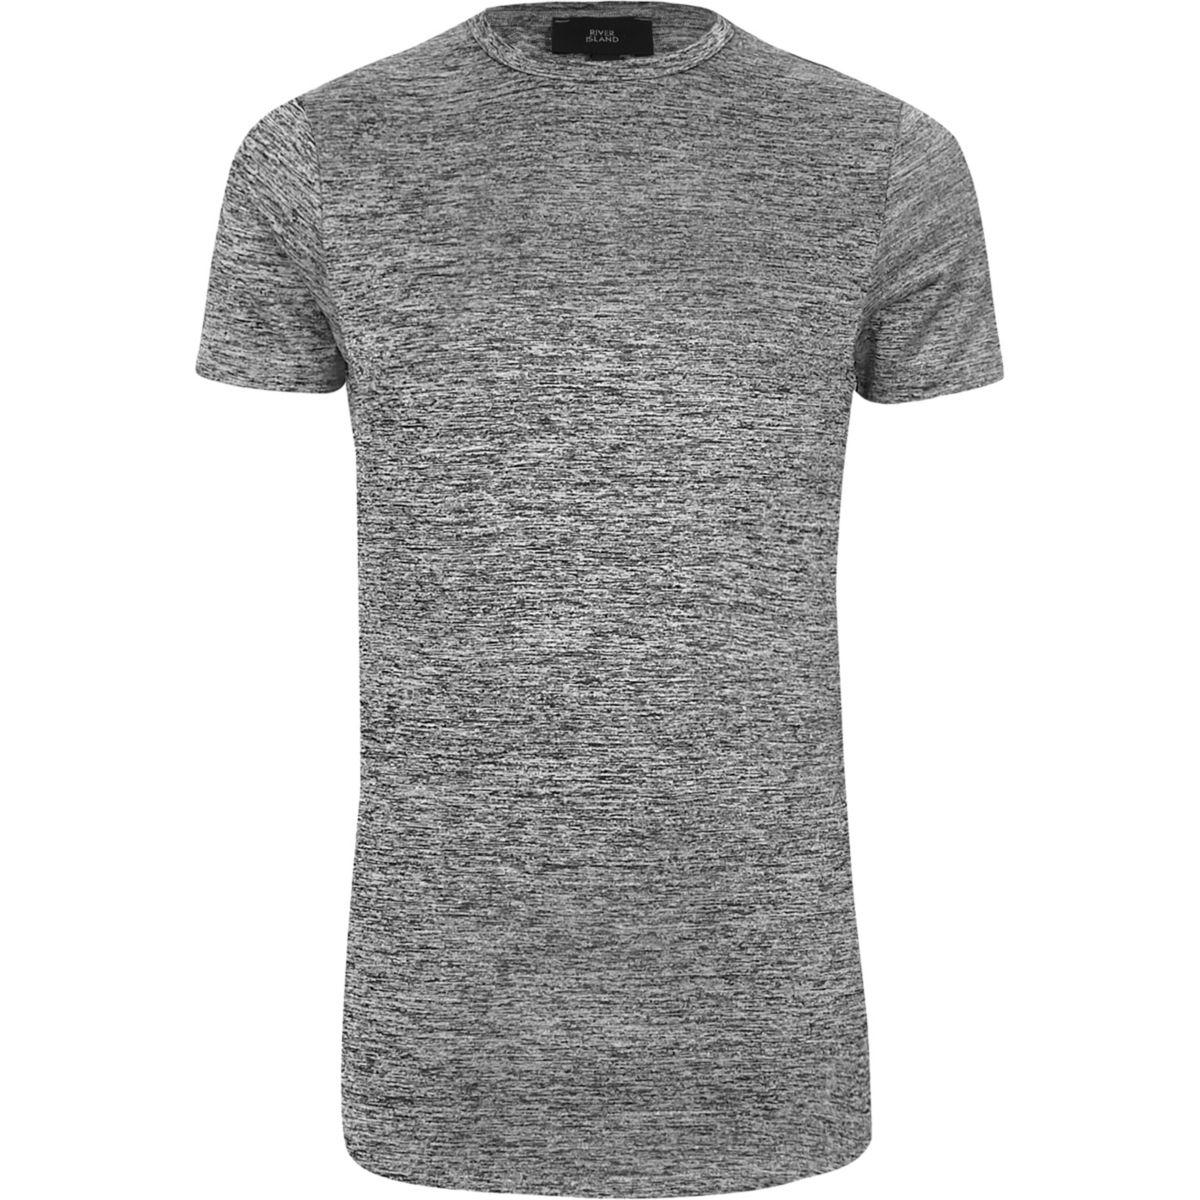 Grey marl muscle fit longline T-shirt